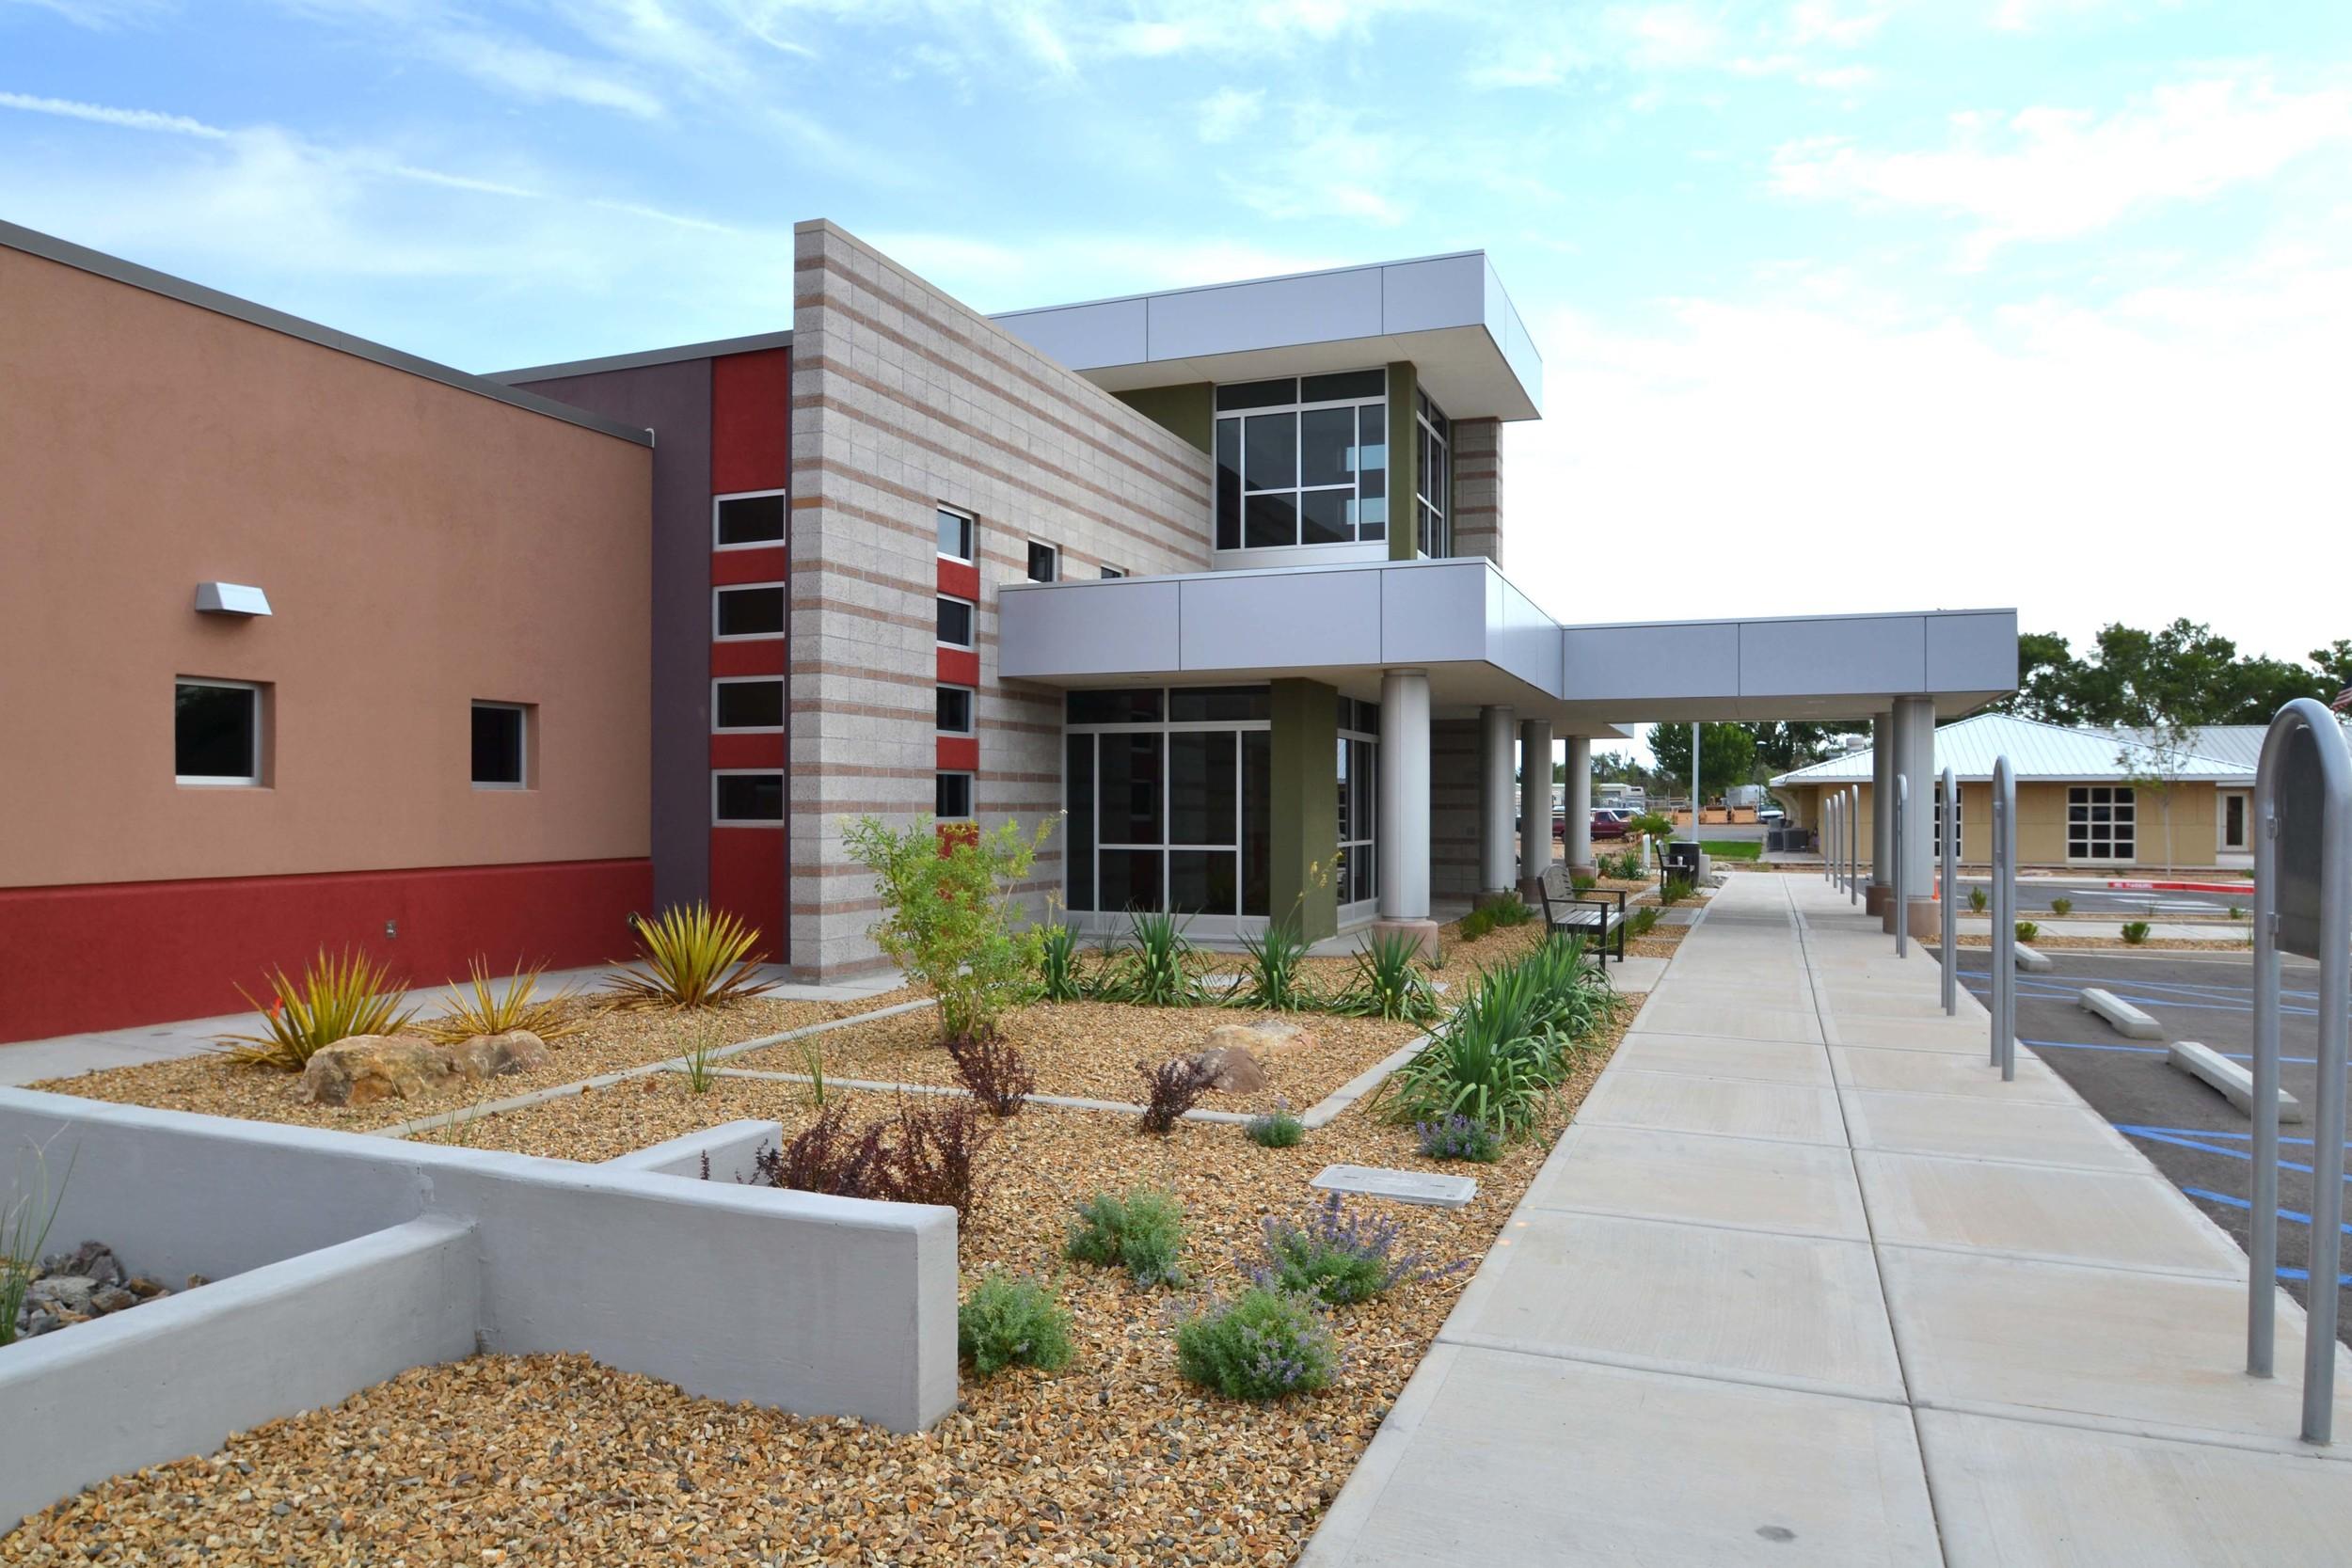 Entry landscape to healthcare building